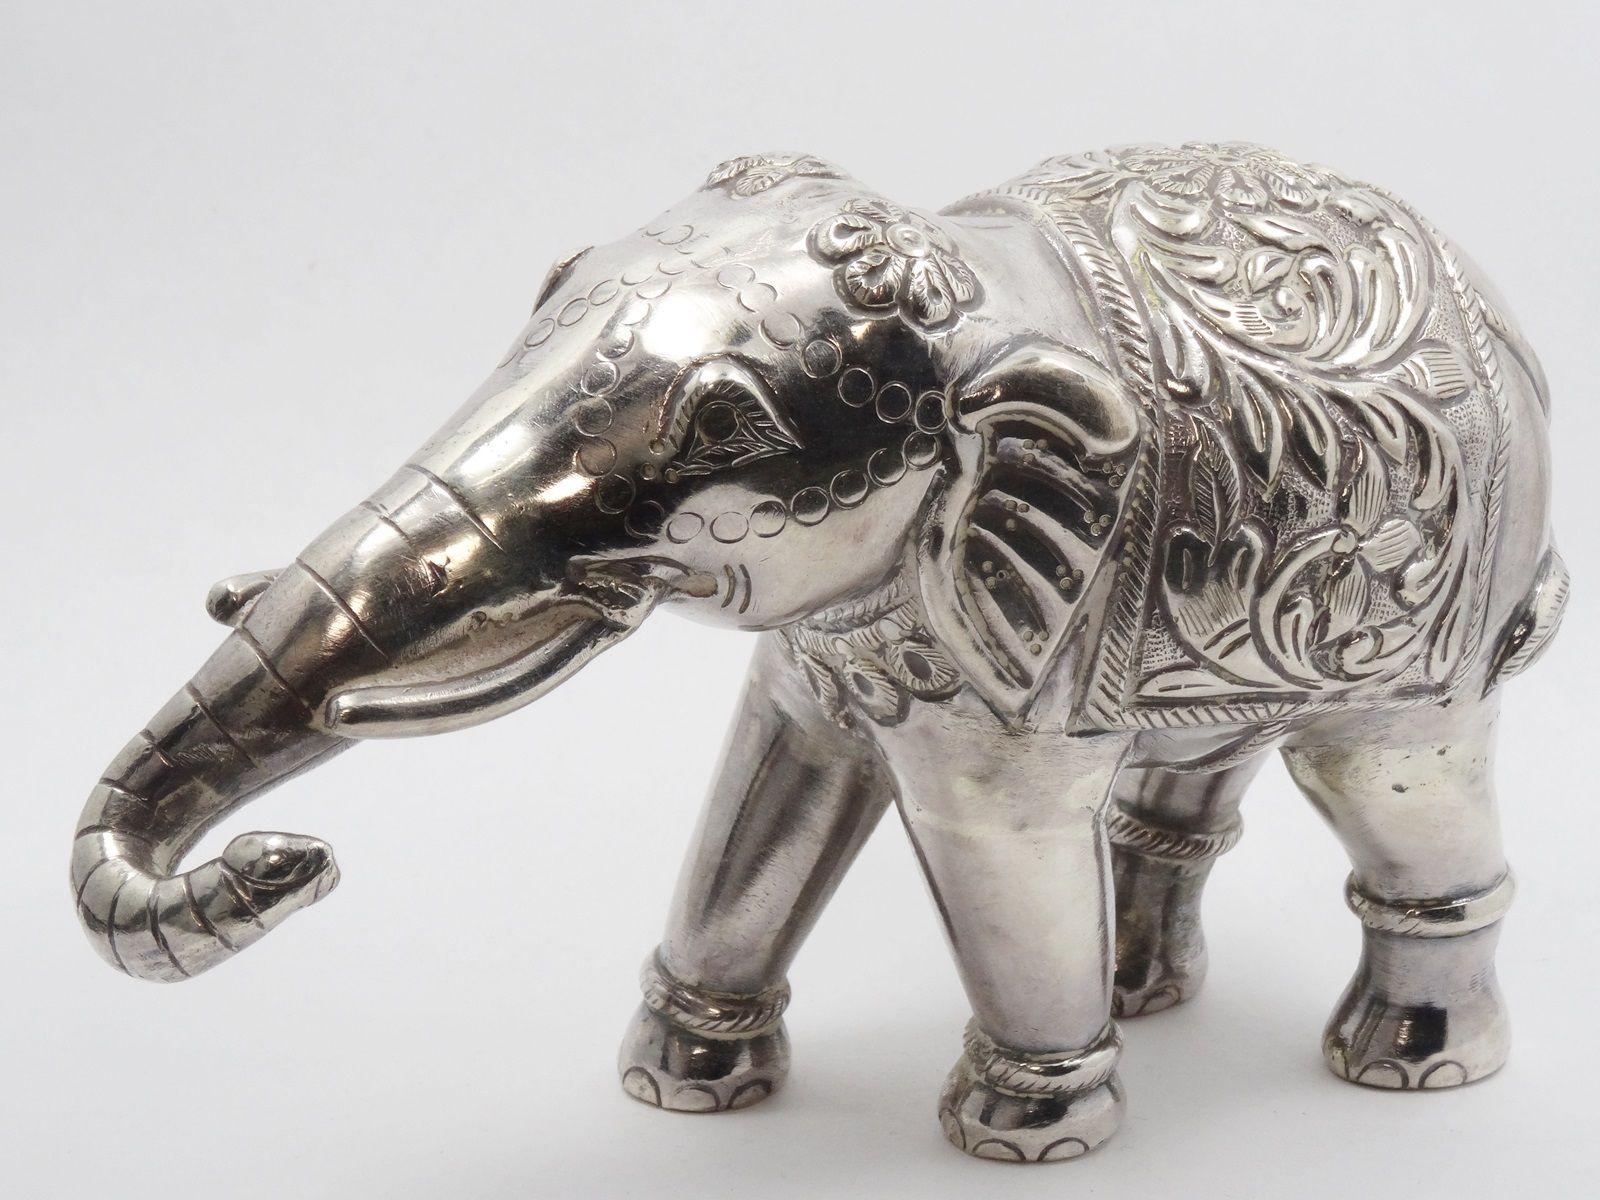 Miniature Sterling Silver Figurine